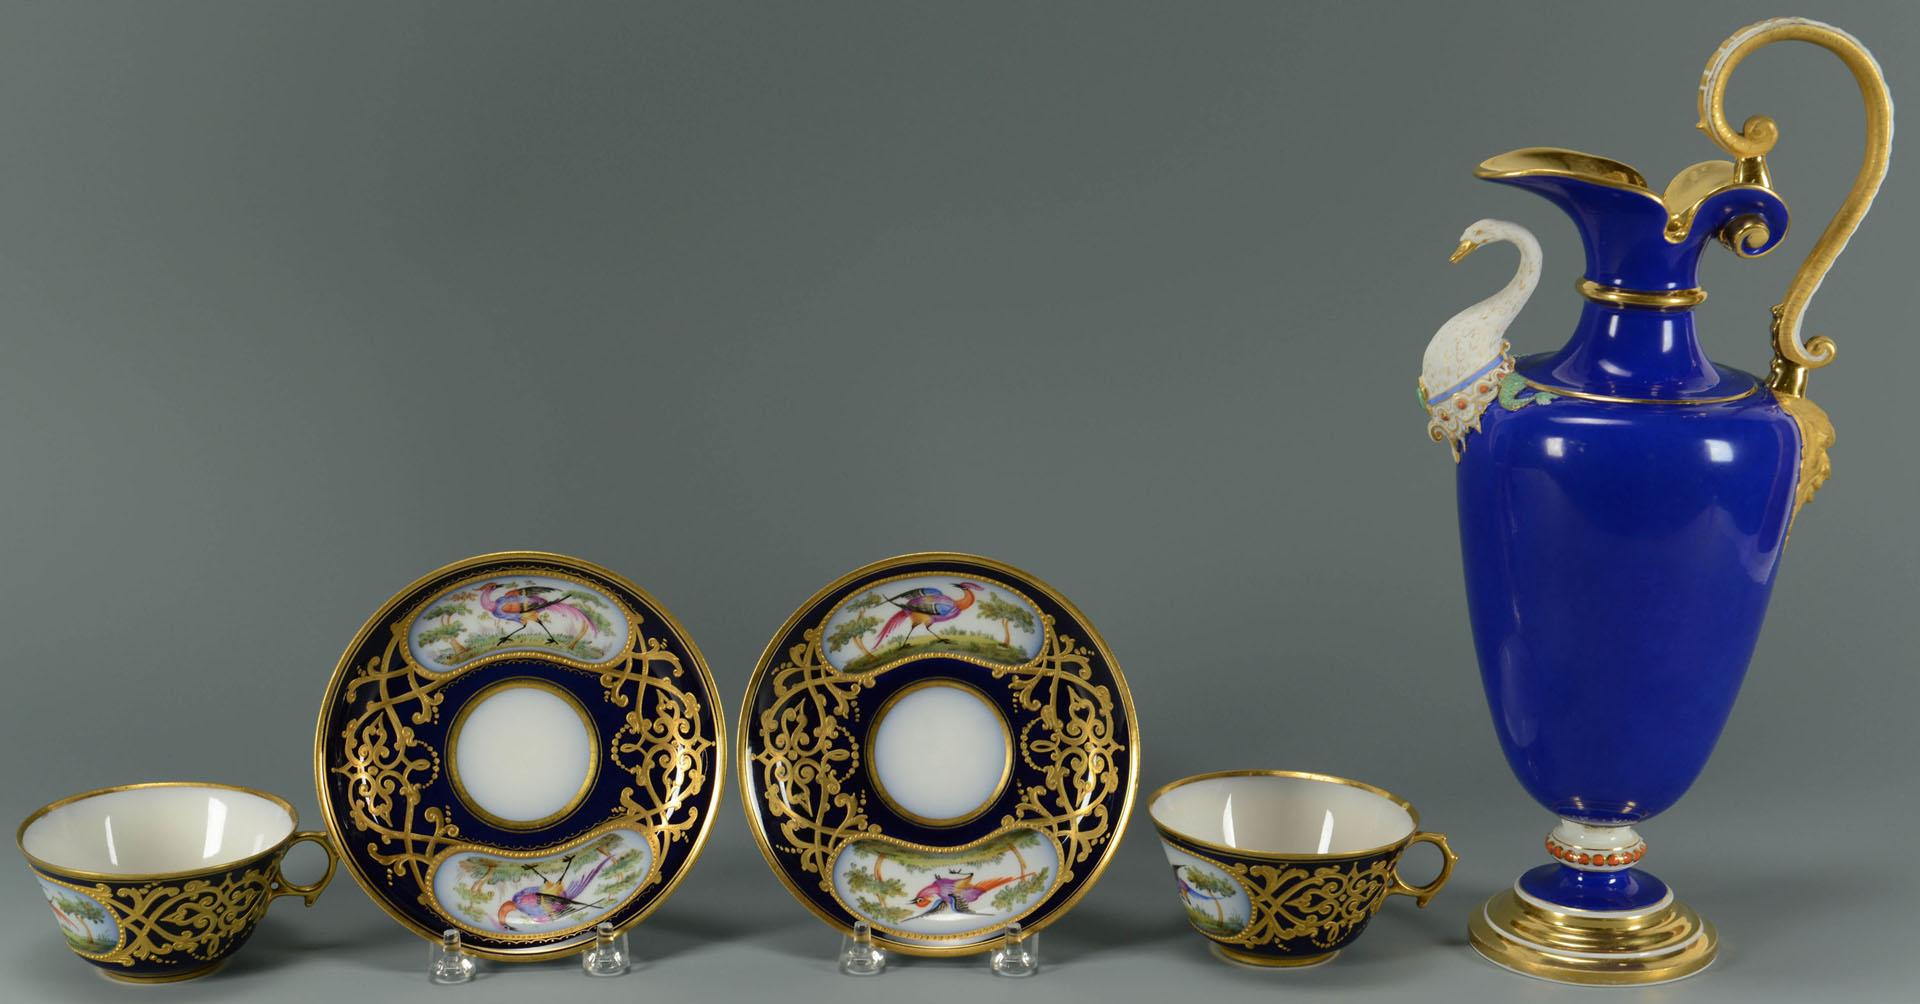 KPM Porcelain Ewer & Sevres Cups w/ Saucers